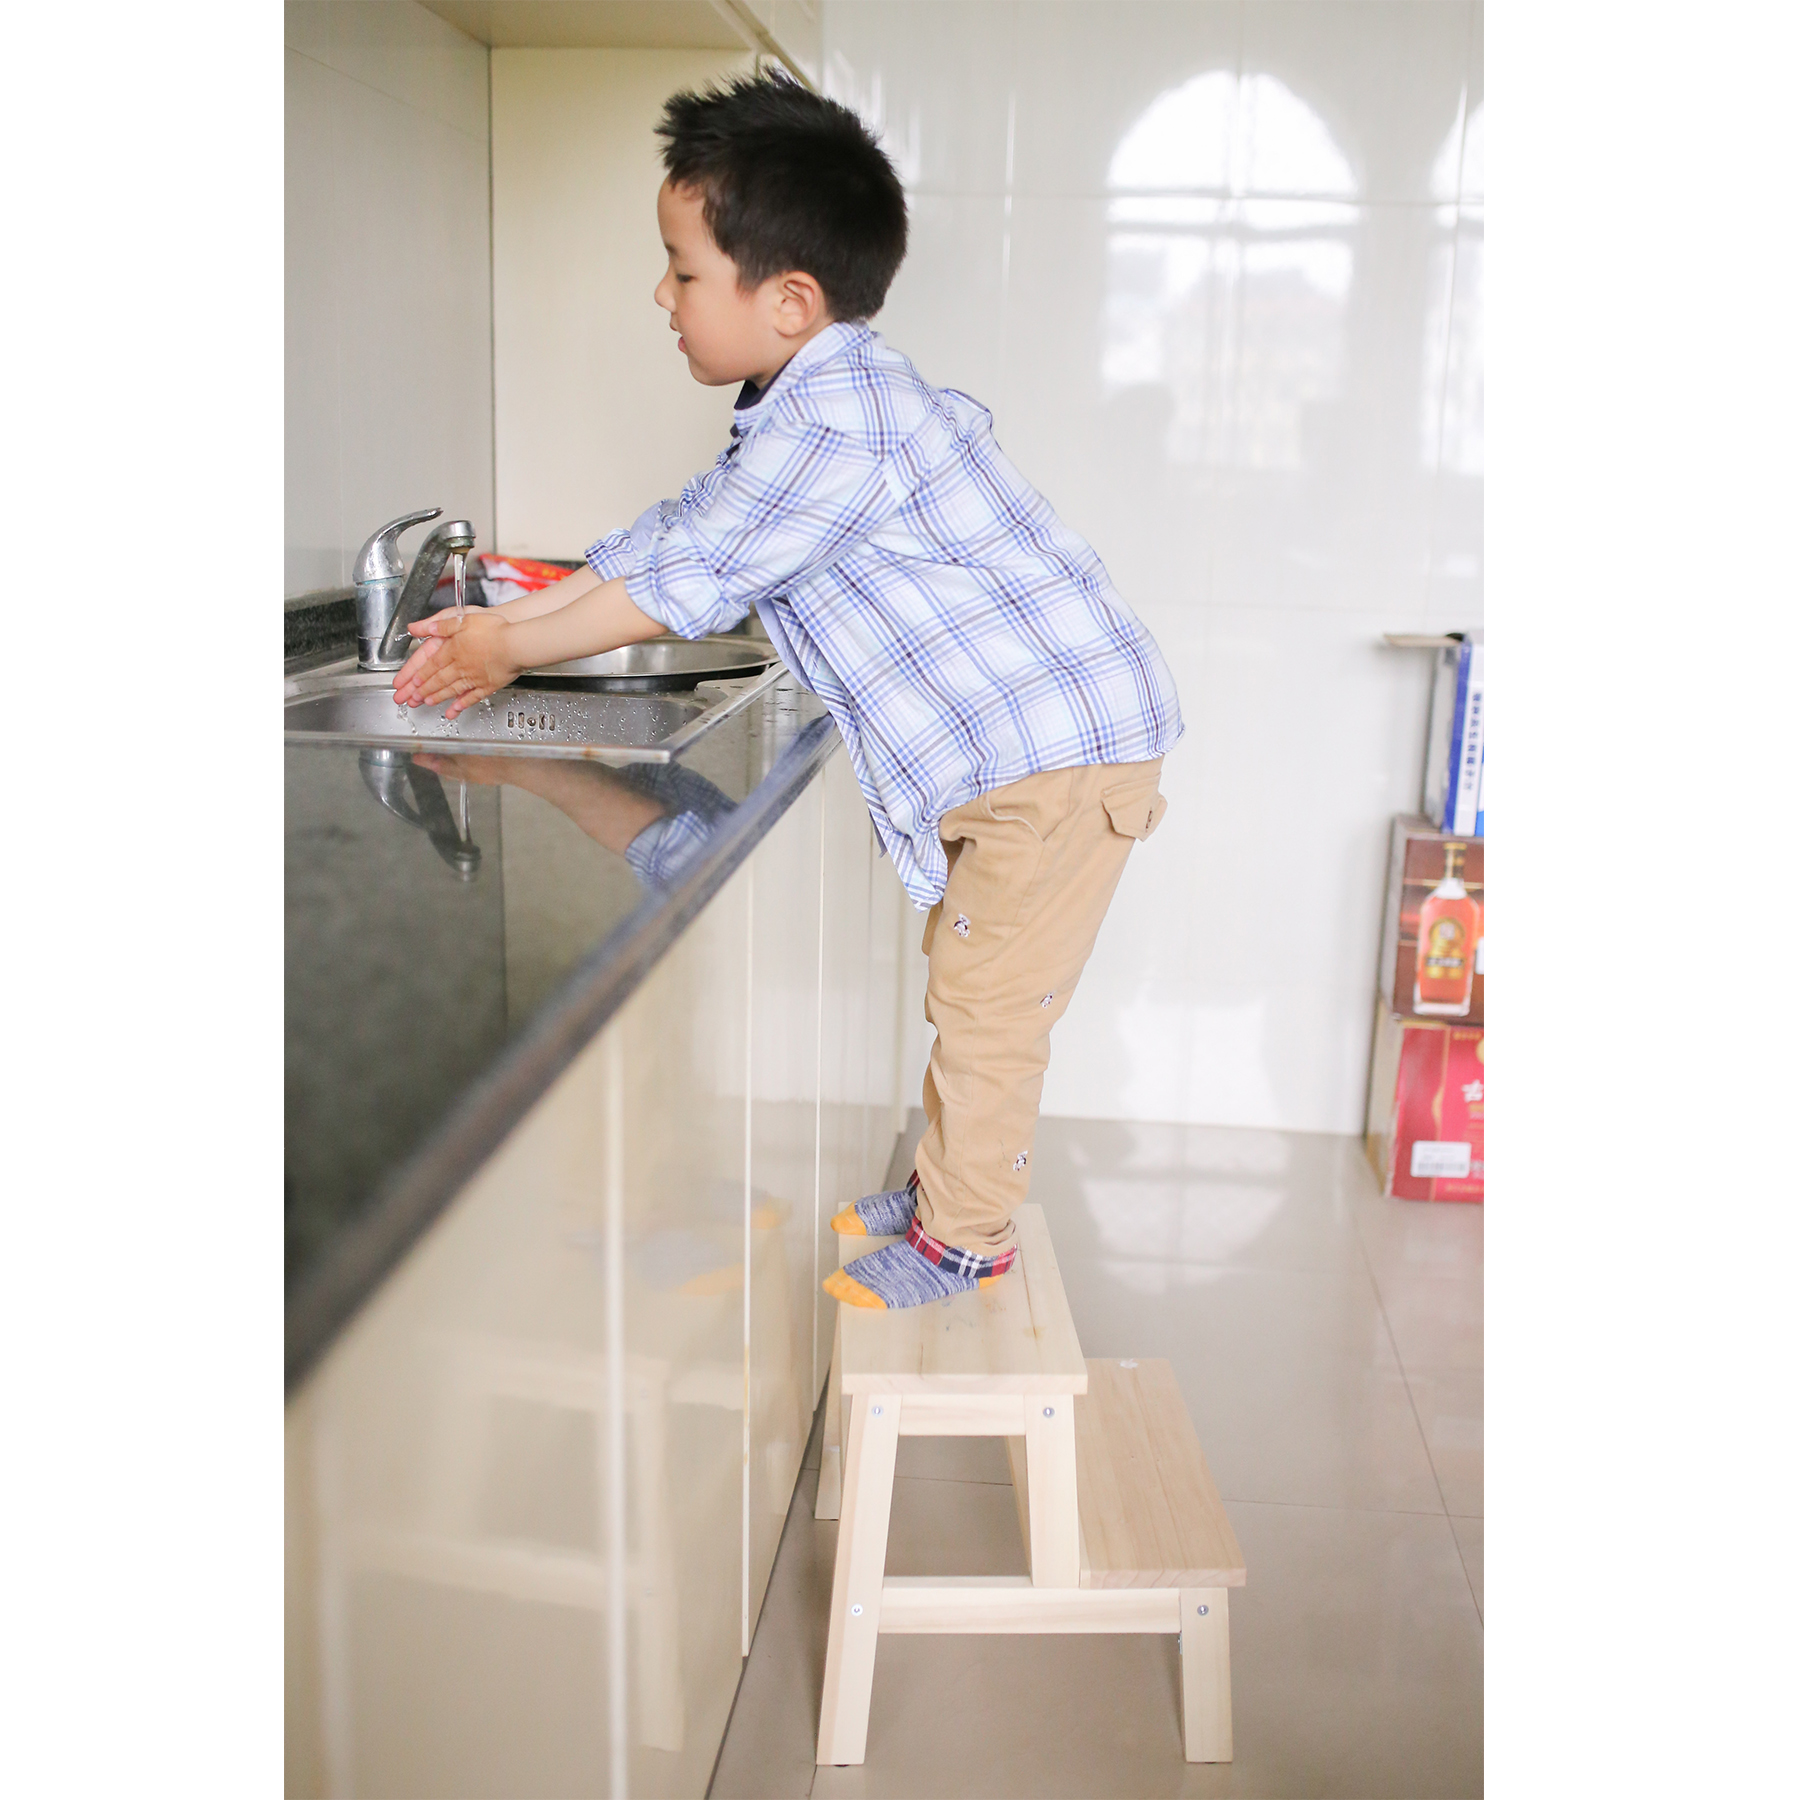 Ребенок ребенок табуретка ребенок мойте руки табуретка дерево протектор скамеечка для ног лестница табуретка лестница табуретка подушка скамеечка для ног выращивание табуретка